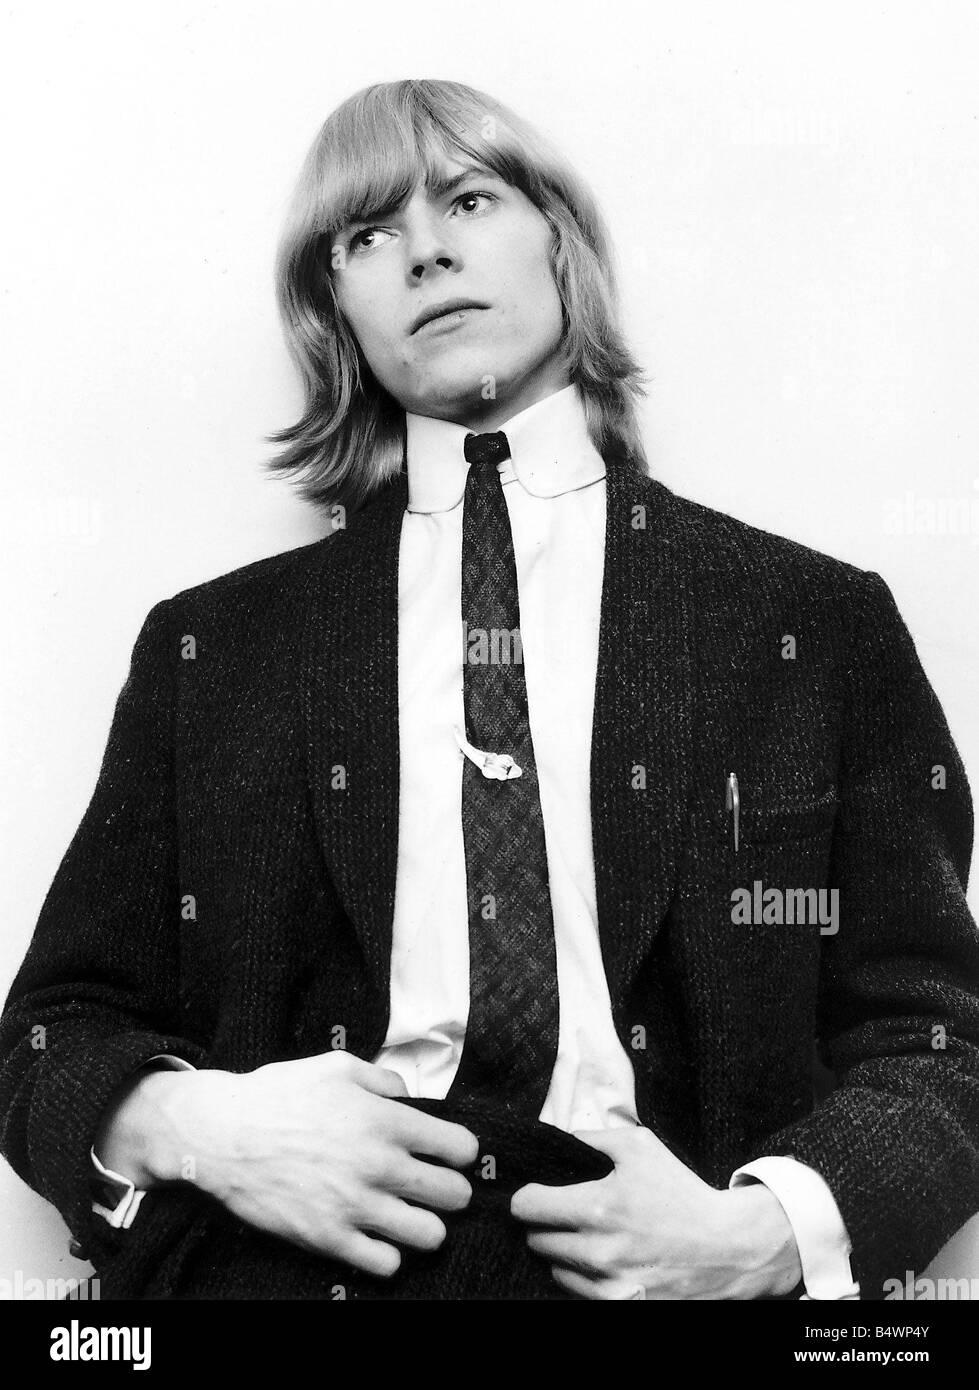 David Bowie Pop Star when he was known as David Jones - Stock Image